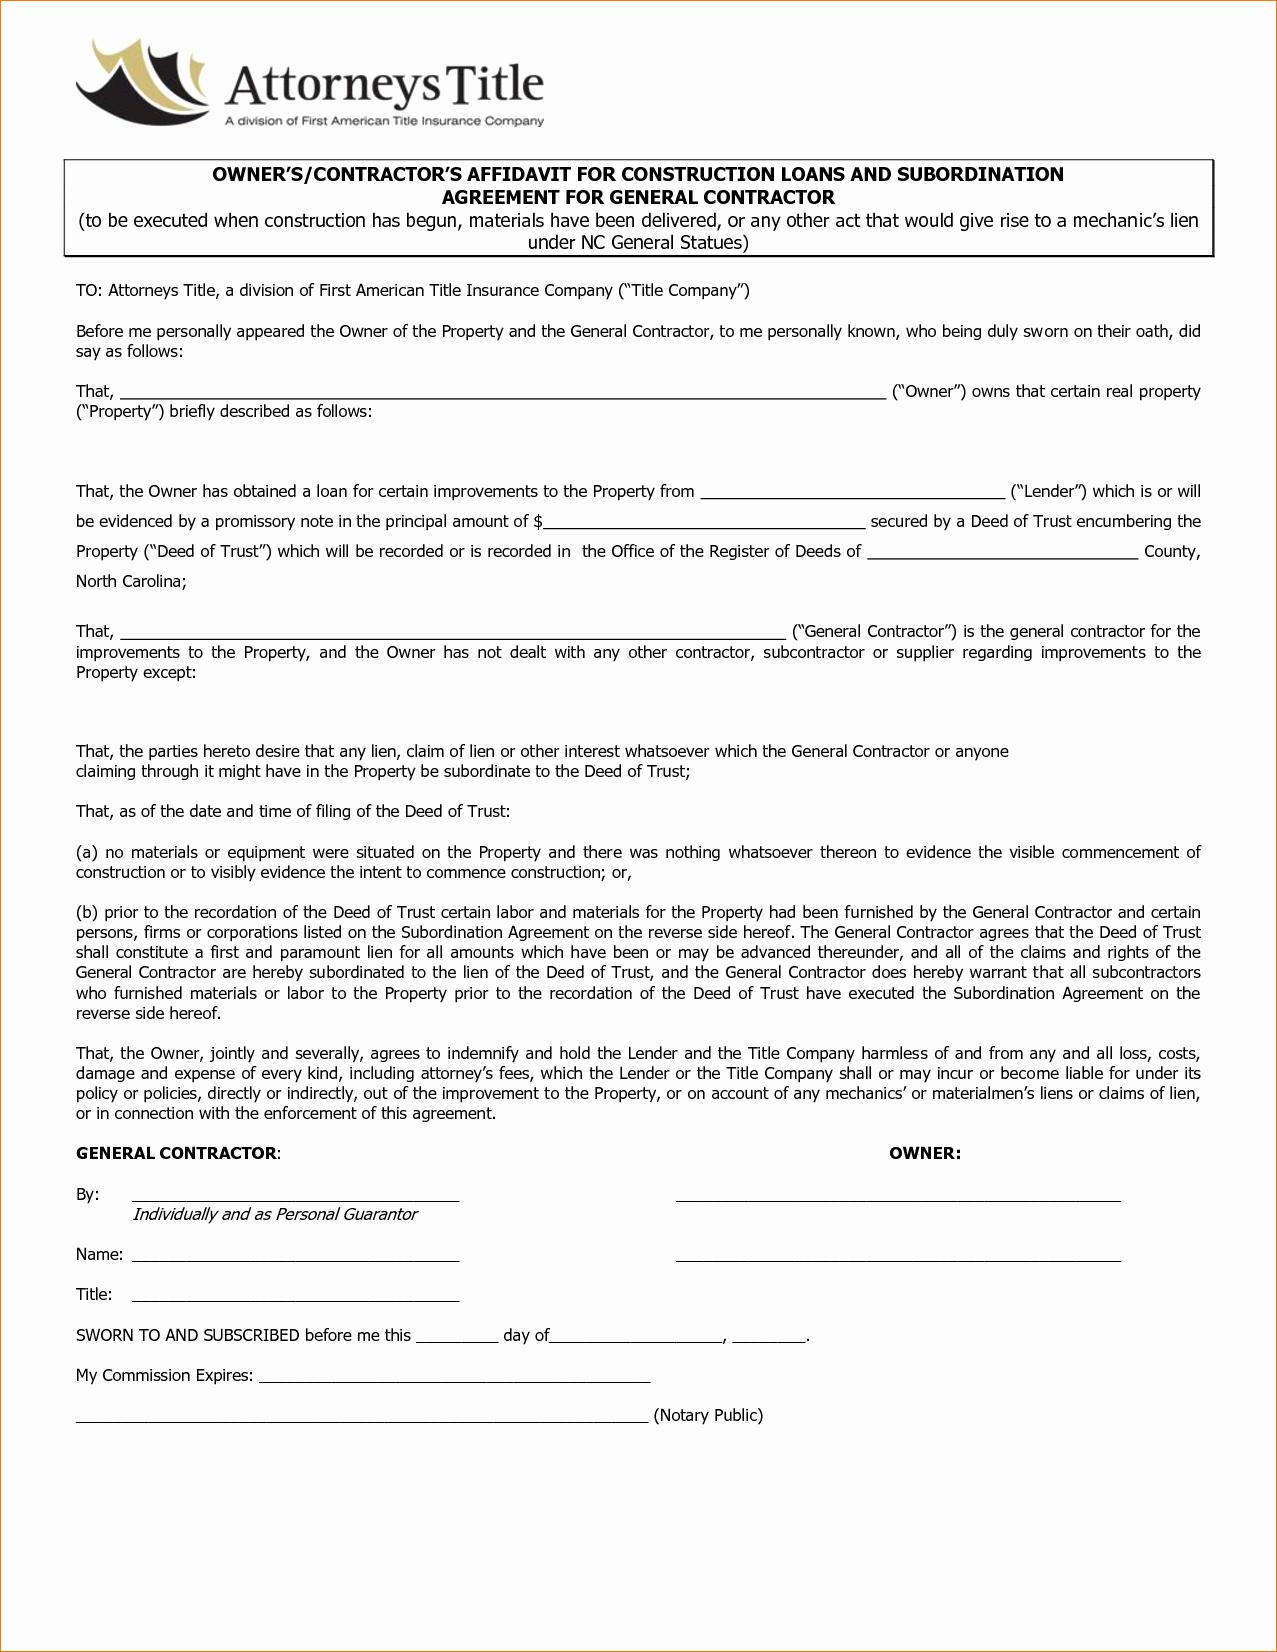 Bid Template for Contractors Beautiful Contractor Agreement Template Featuring General Contractor